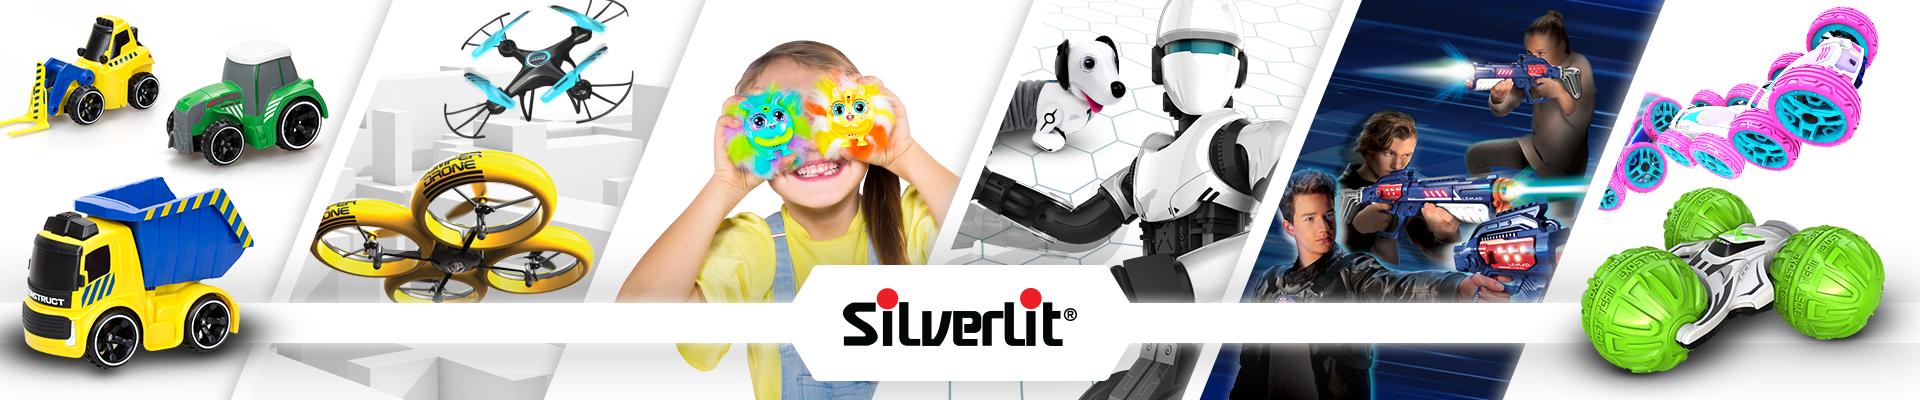 Silverlit